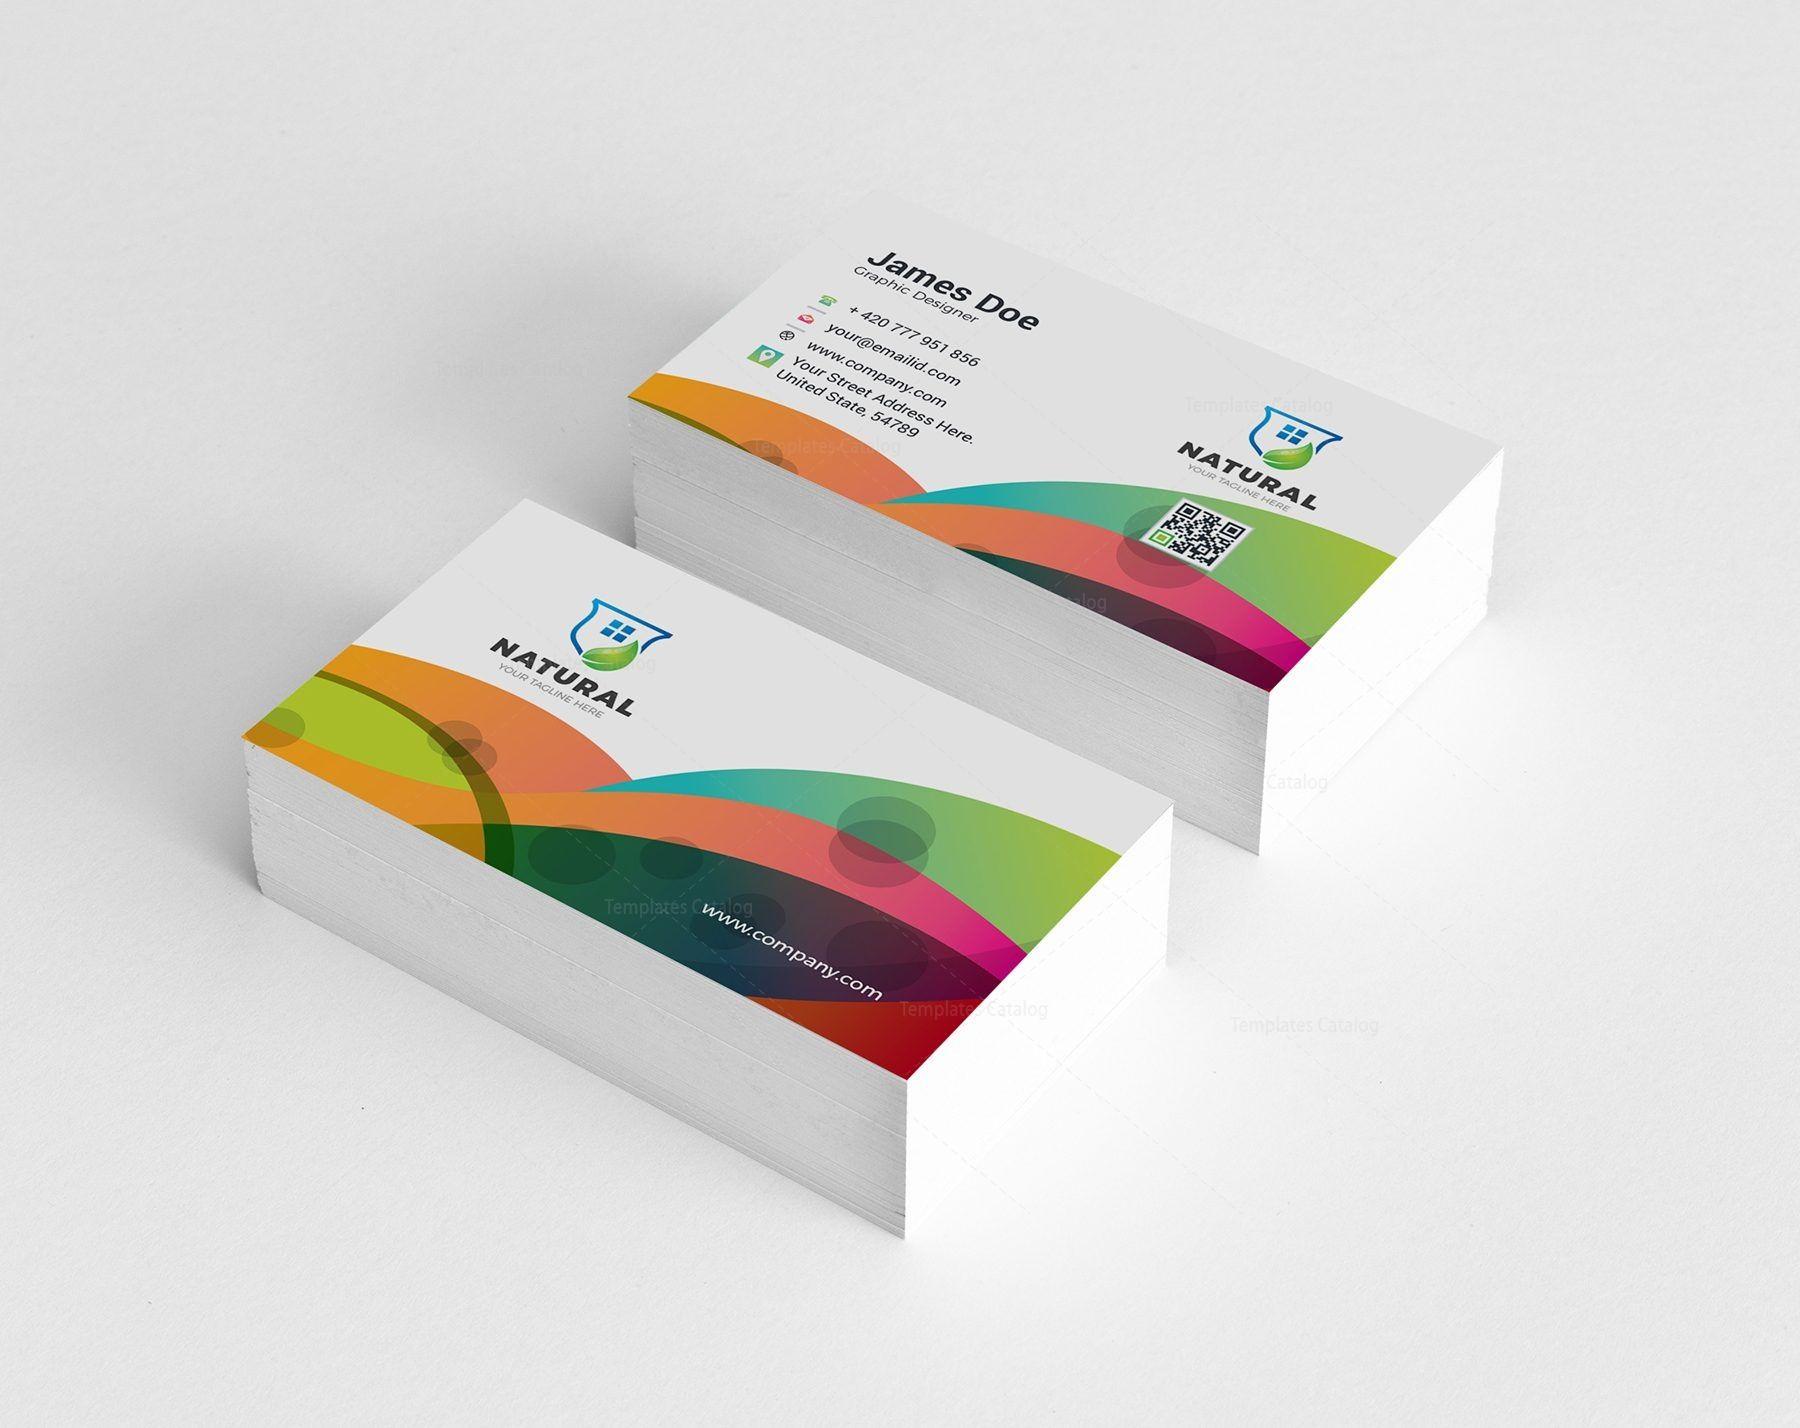 Colorful Creative Business Card Design 002130 Template Catalog Business Card Design Creative Business Cards Creative Business Card Design